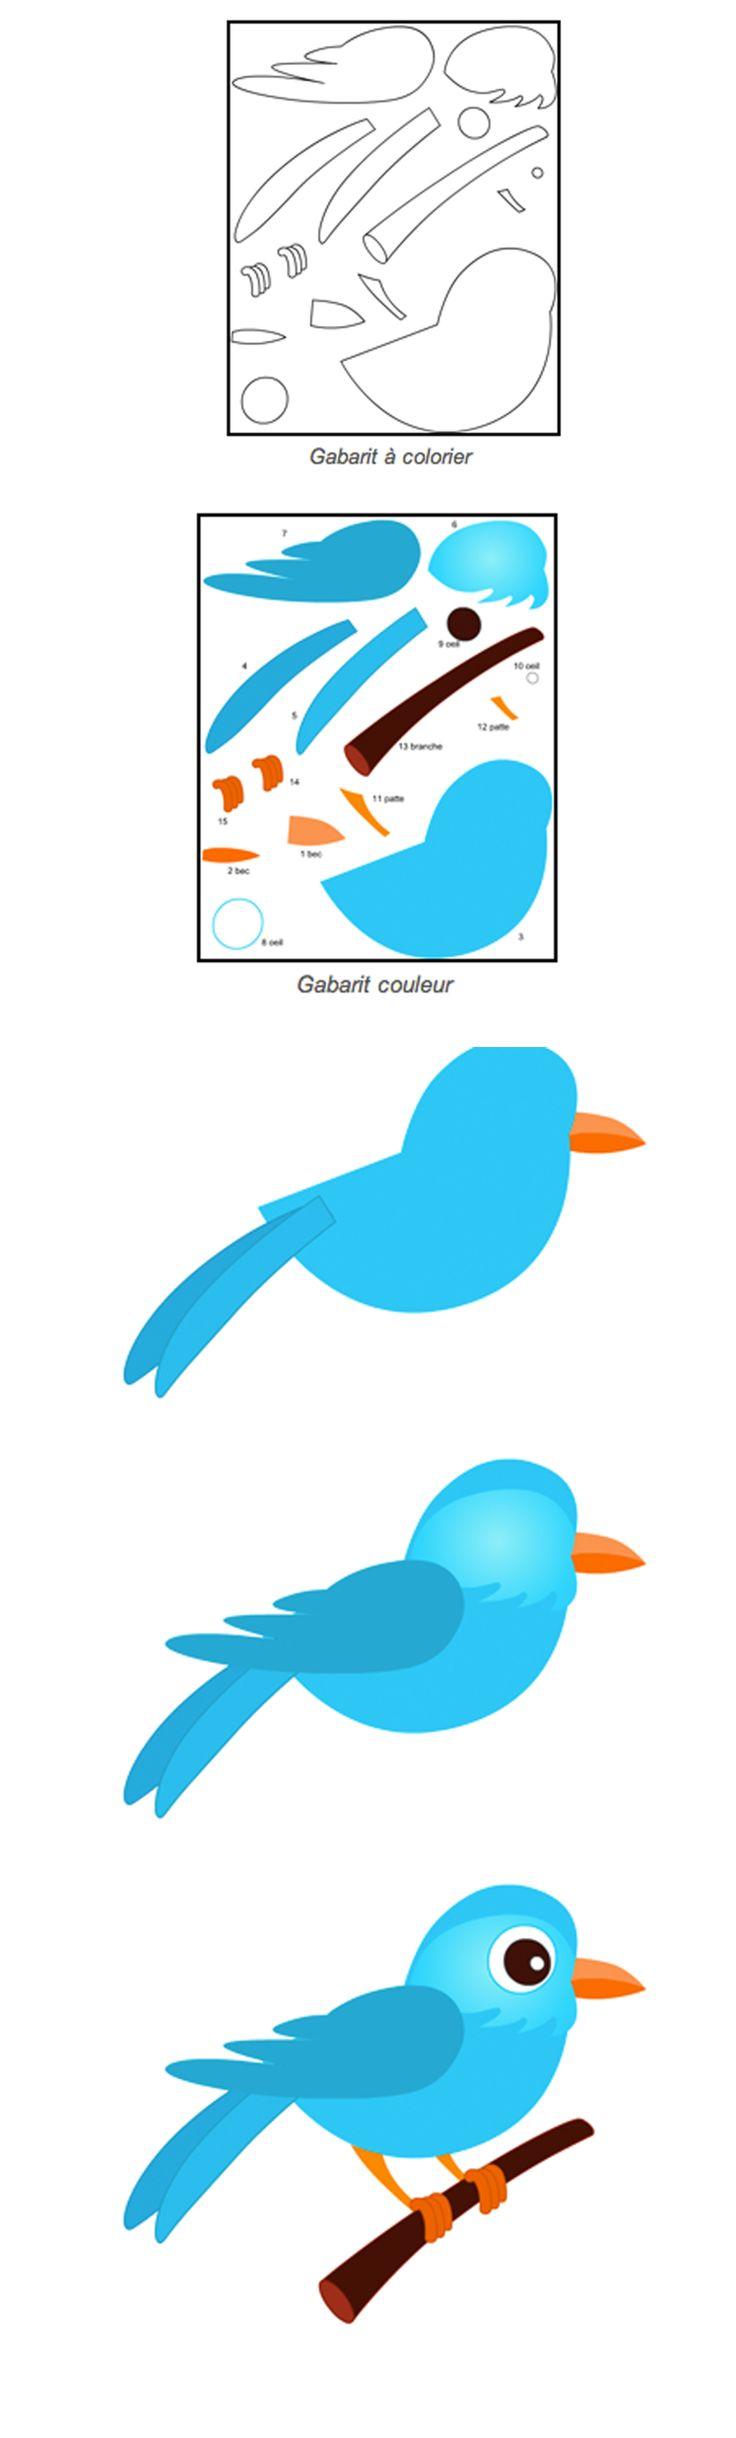 http://turbulus.com/bricolage/decoupage-collage/342-decoupage-oiseau